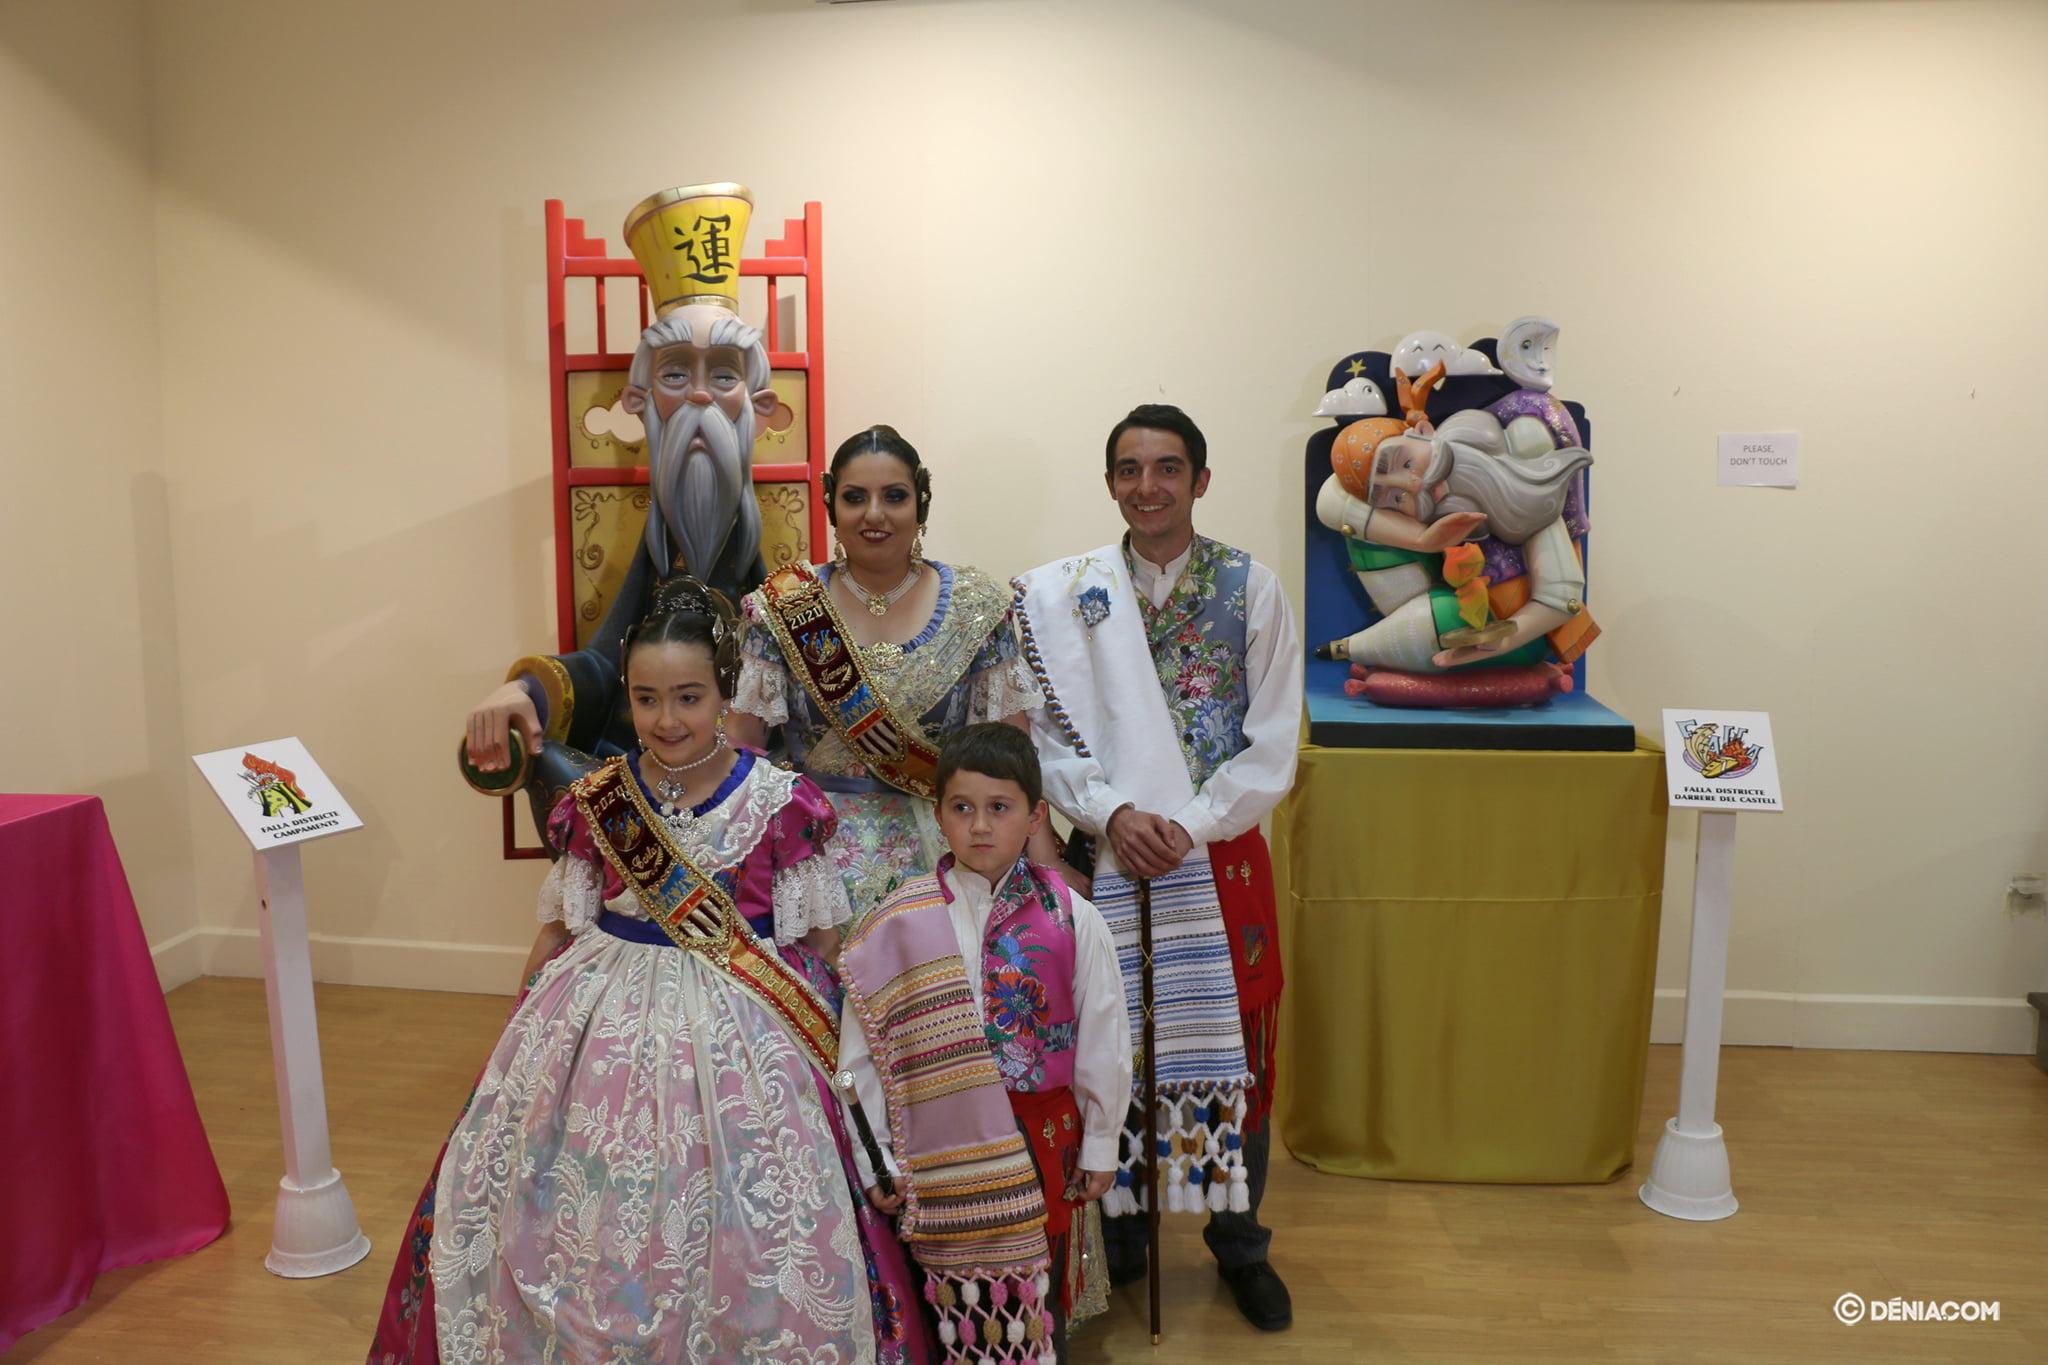 Ninot 2020 Exhibition - Falla Darrere del Castell